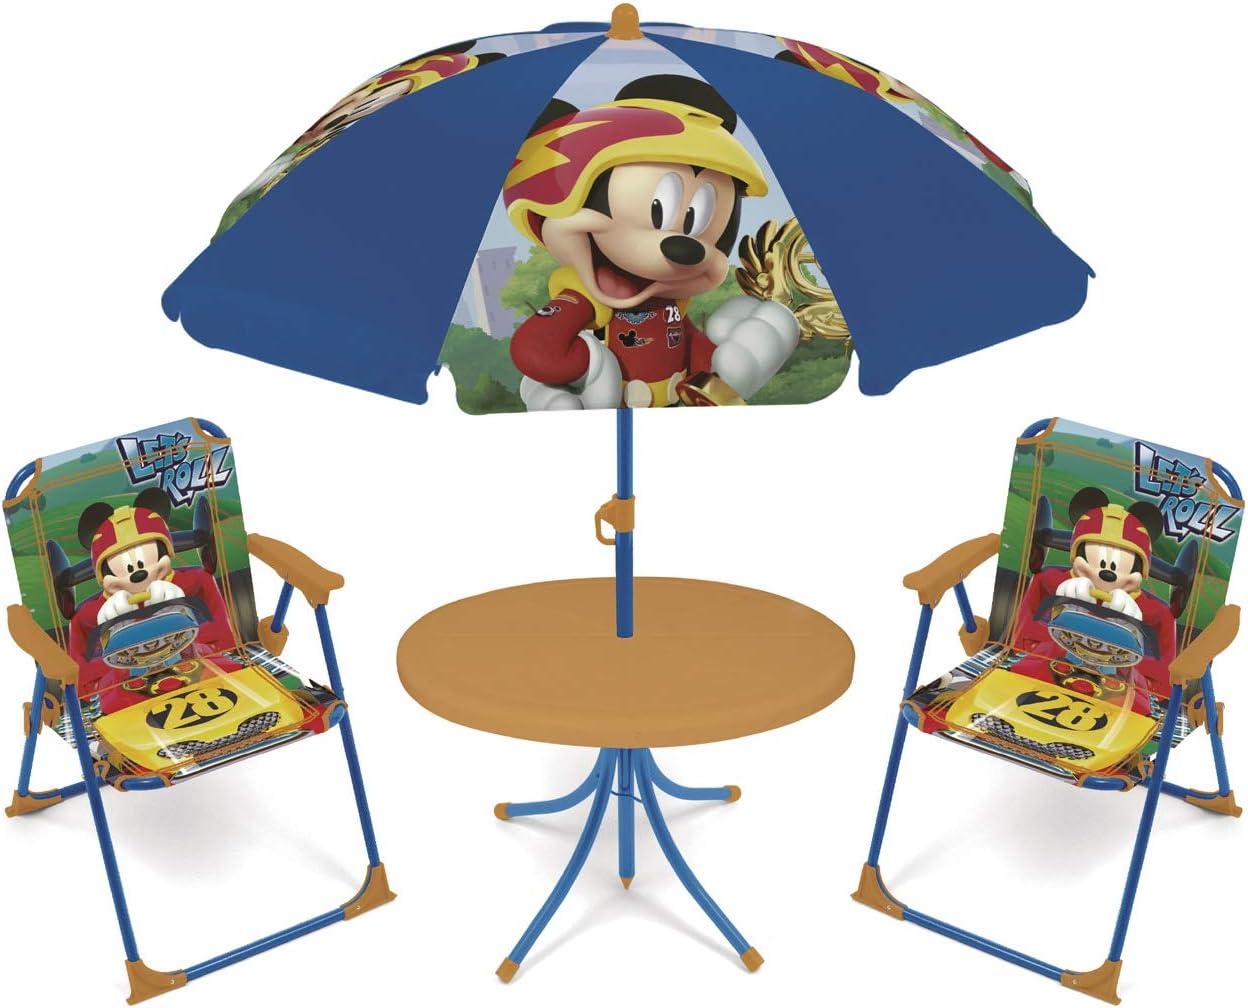 ARDITEX WD12492 Set de Mesa (50x50x48cm), 2 Sillas (38x32x53cm) y Sombrilla (diámetro 110cm) de Disney-Mickey